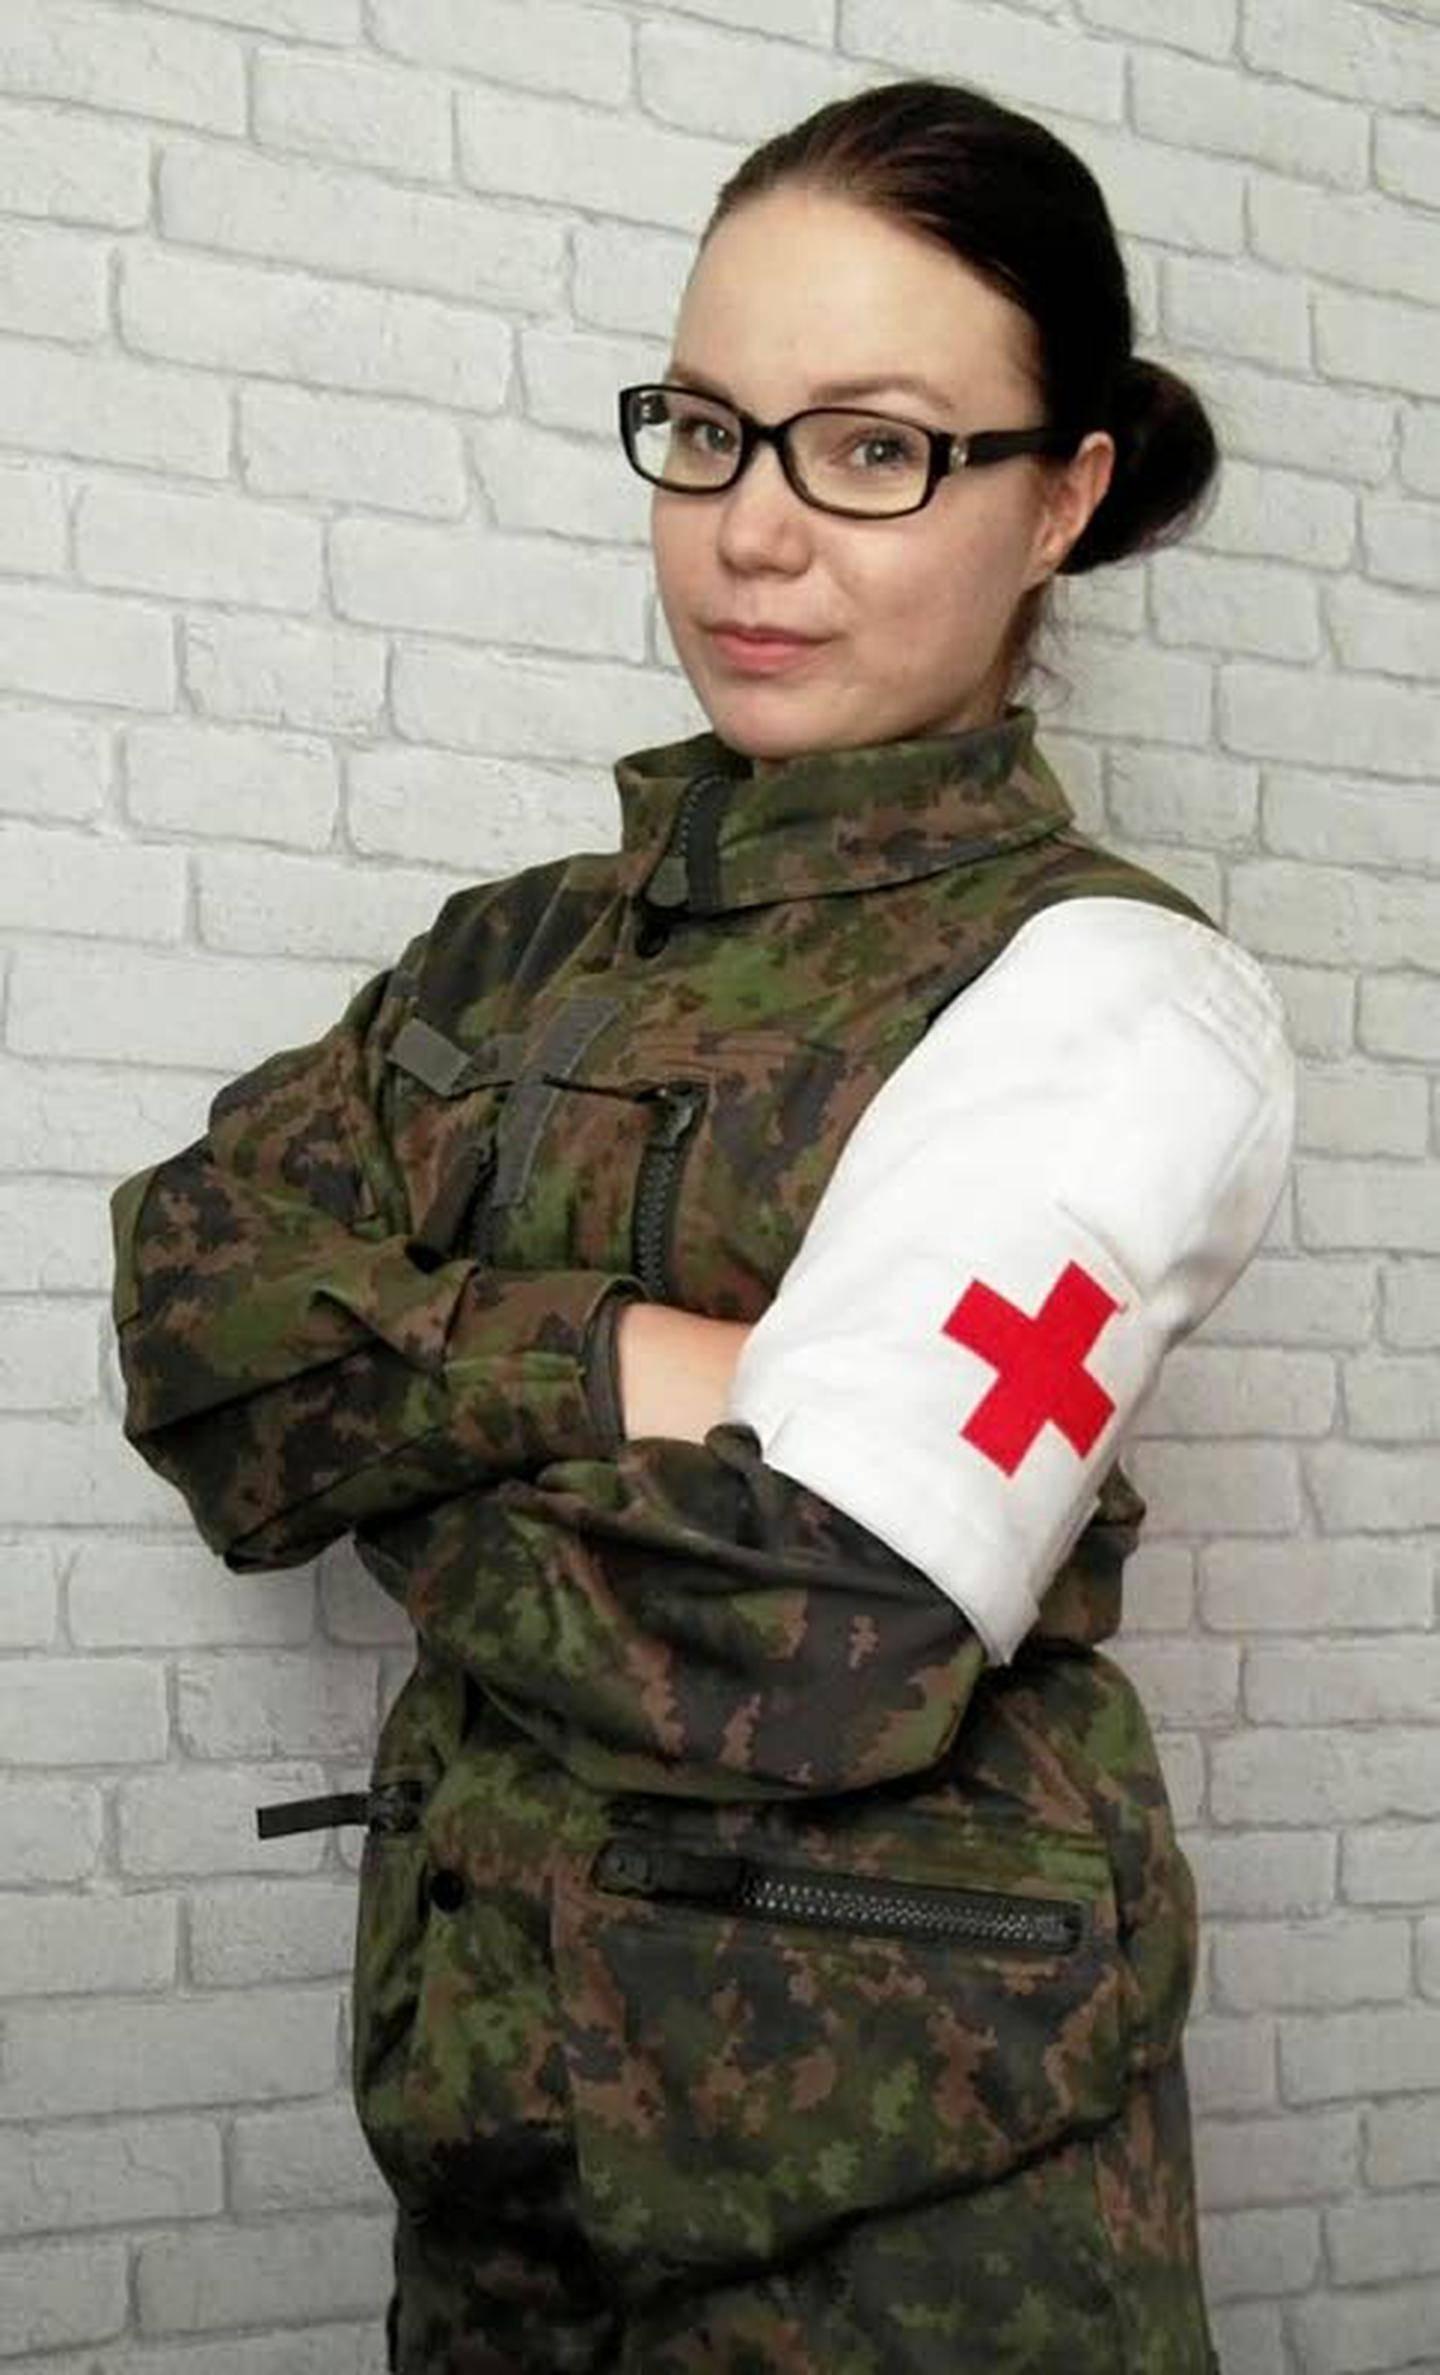 Lääkintämies Armeija